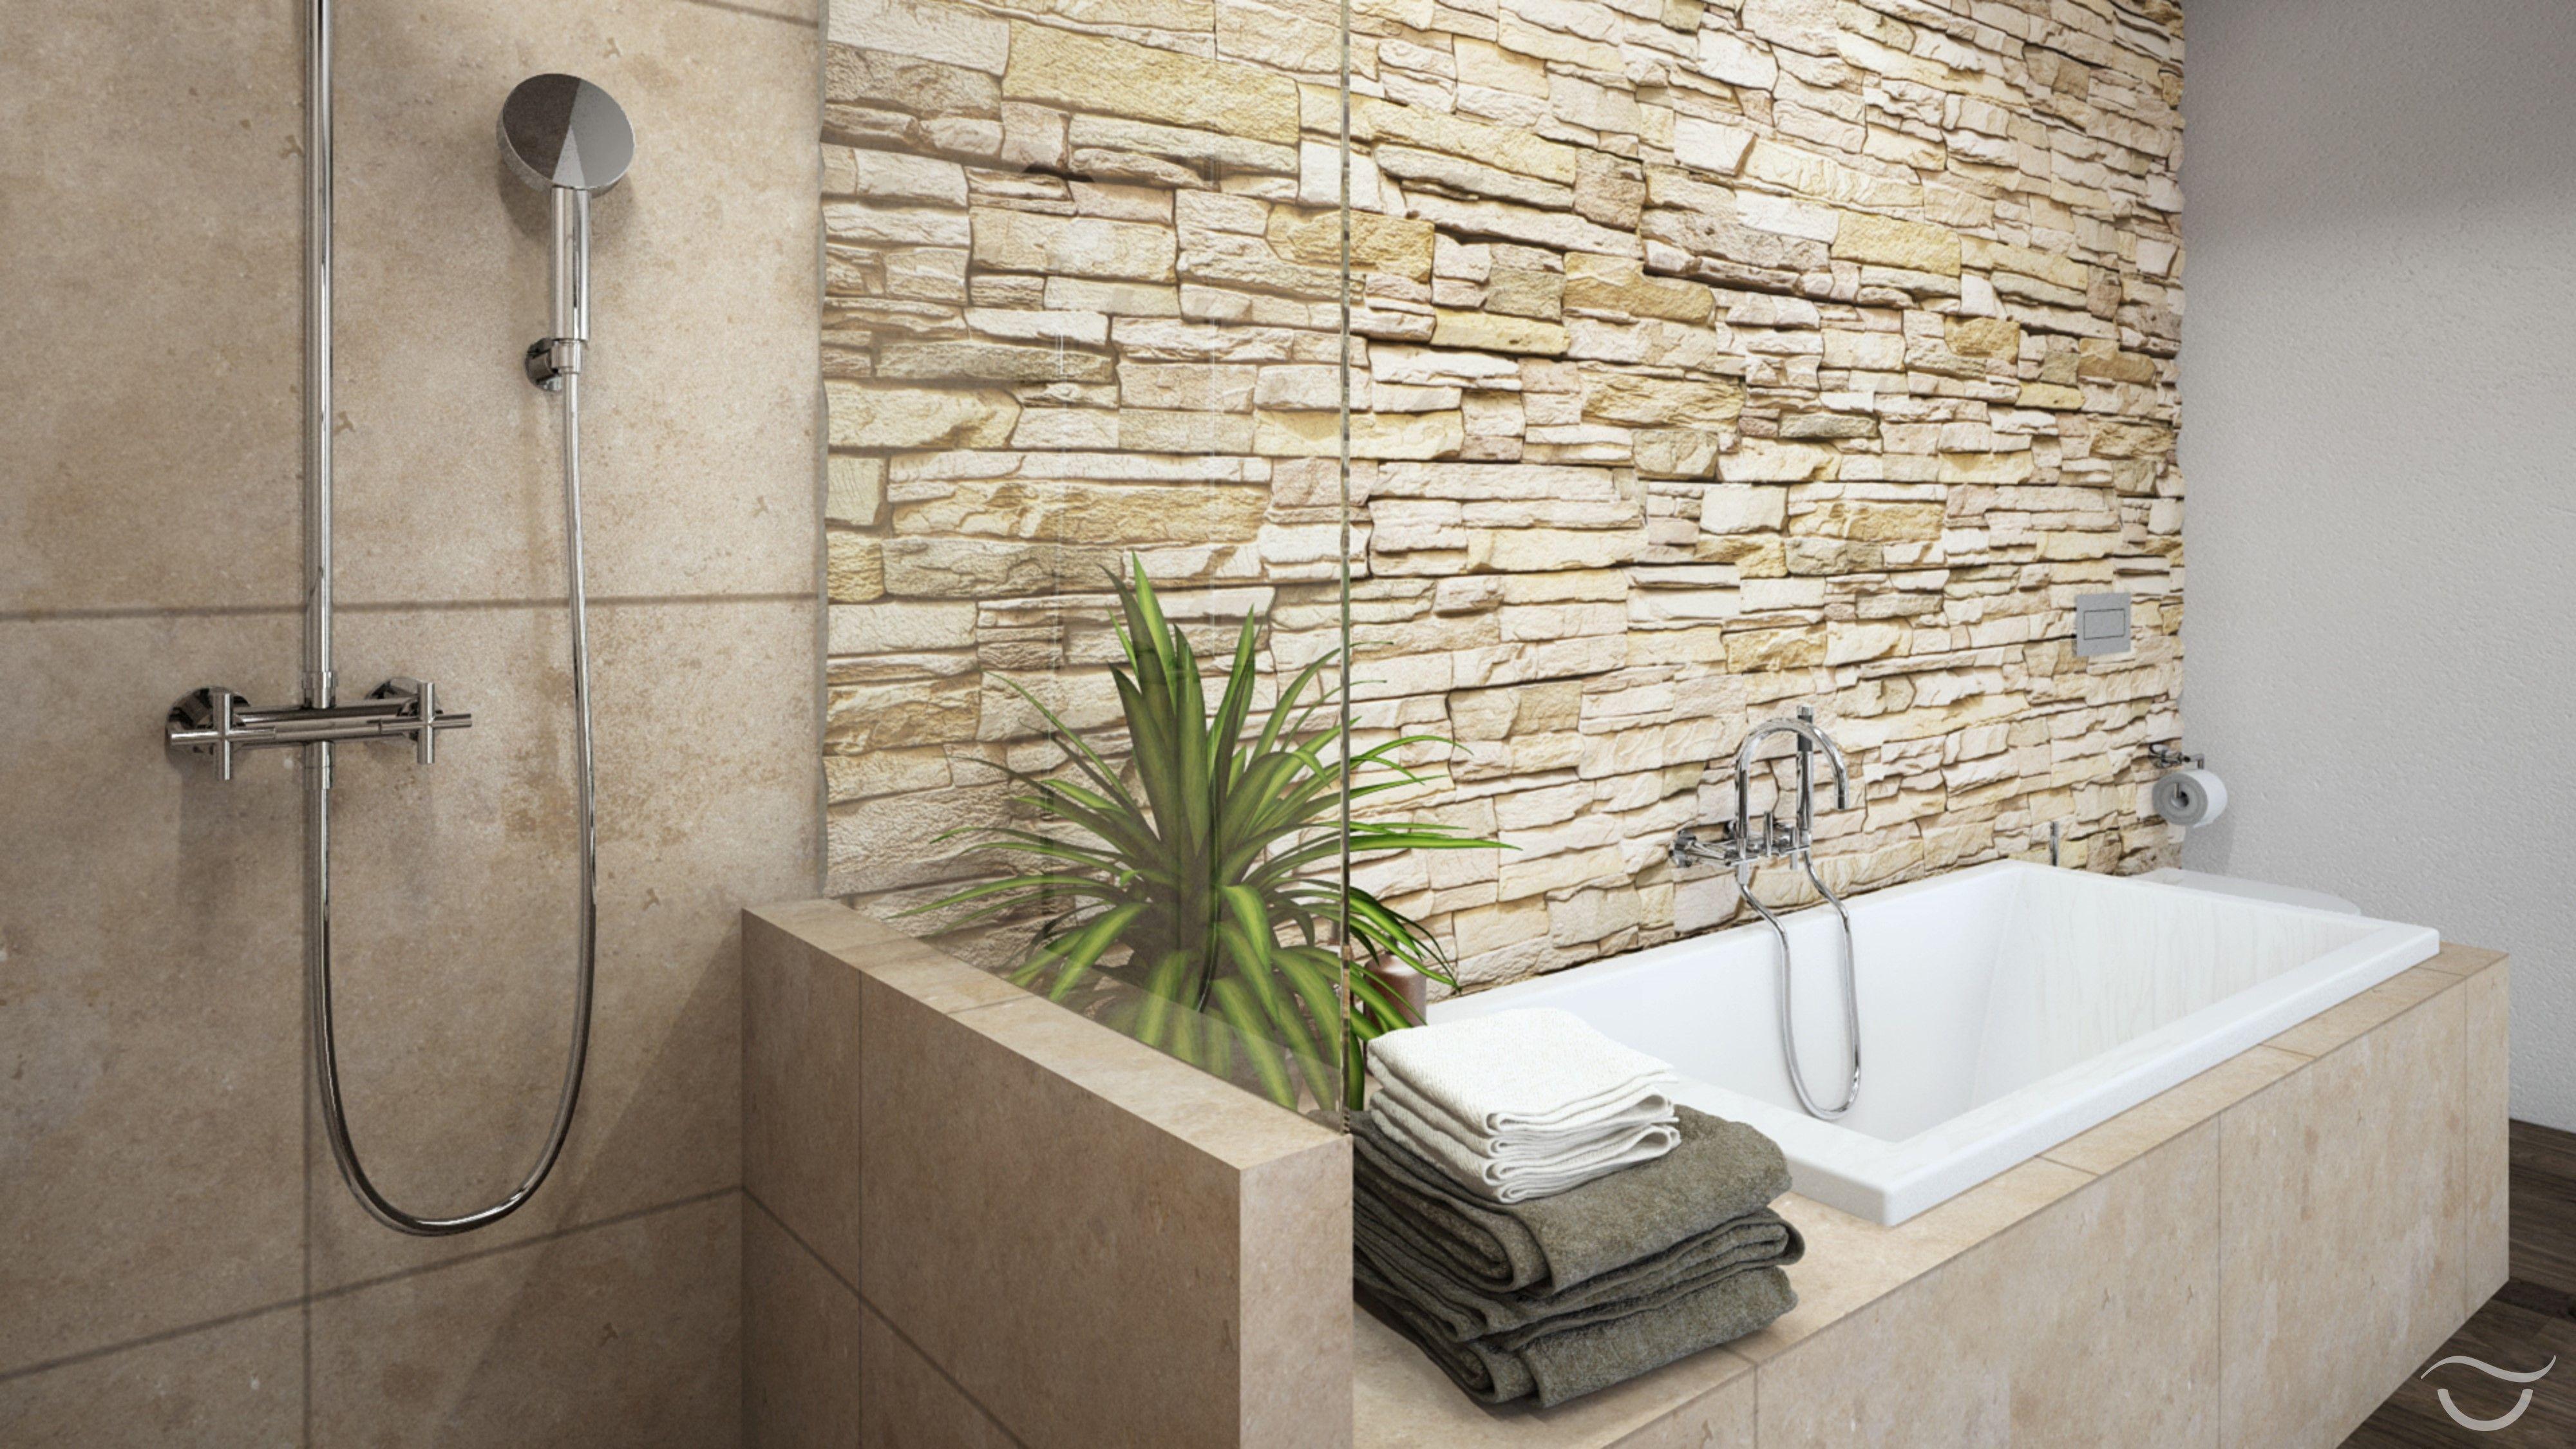 Stone wall | Haus | Pinterest | Stone walls and Walls